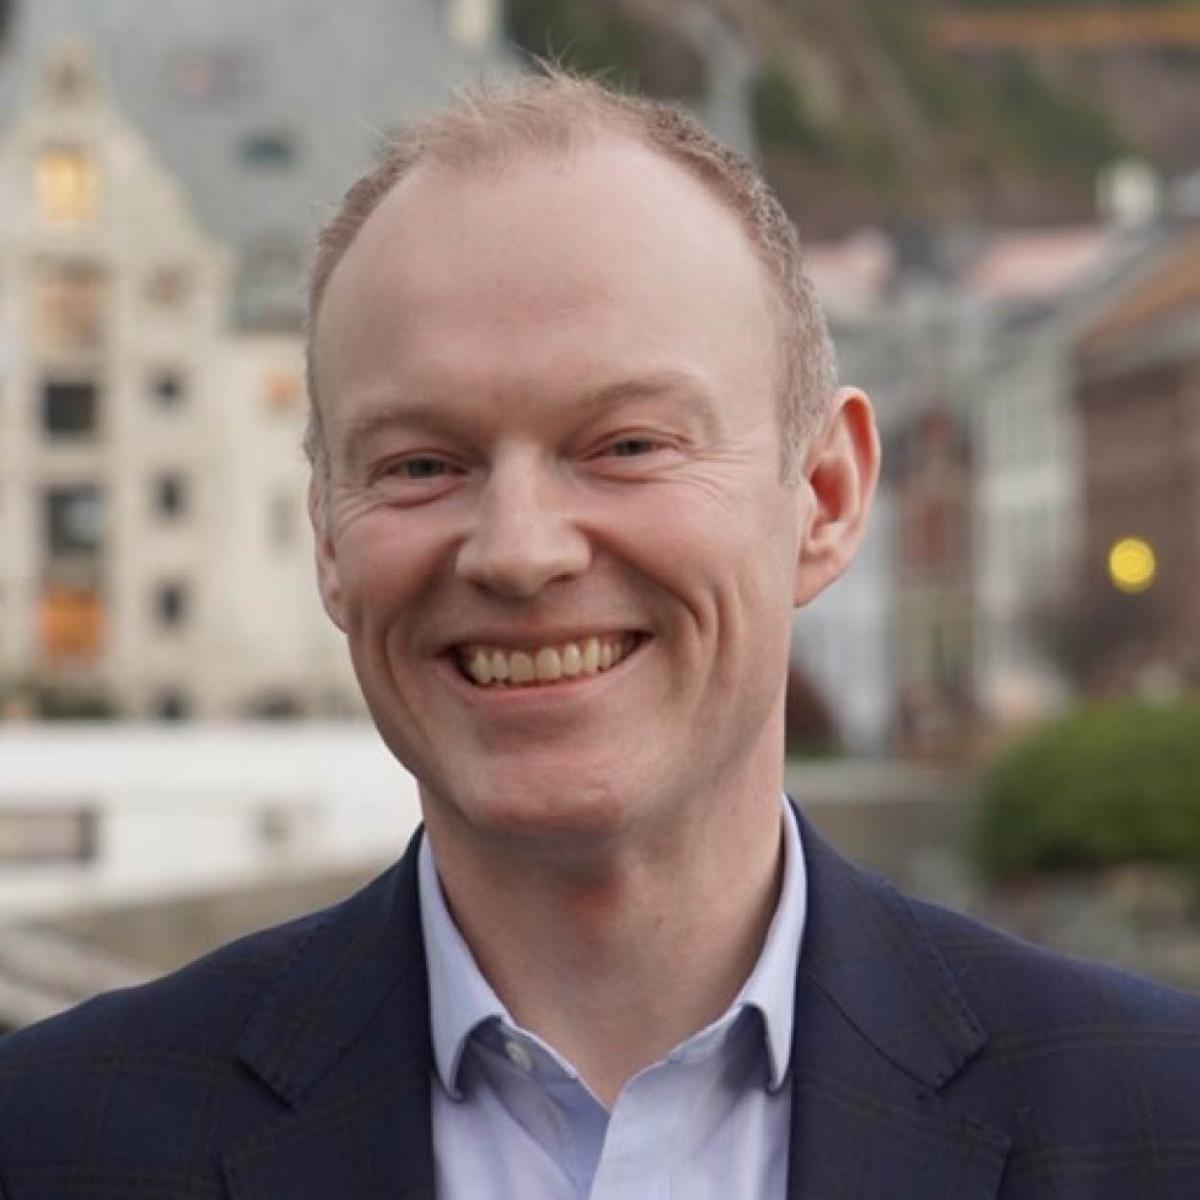 Reidar Thorstensen Key Account Manager i KLM Royal Dutch Airlines NORWAY